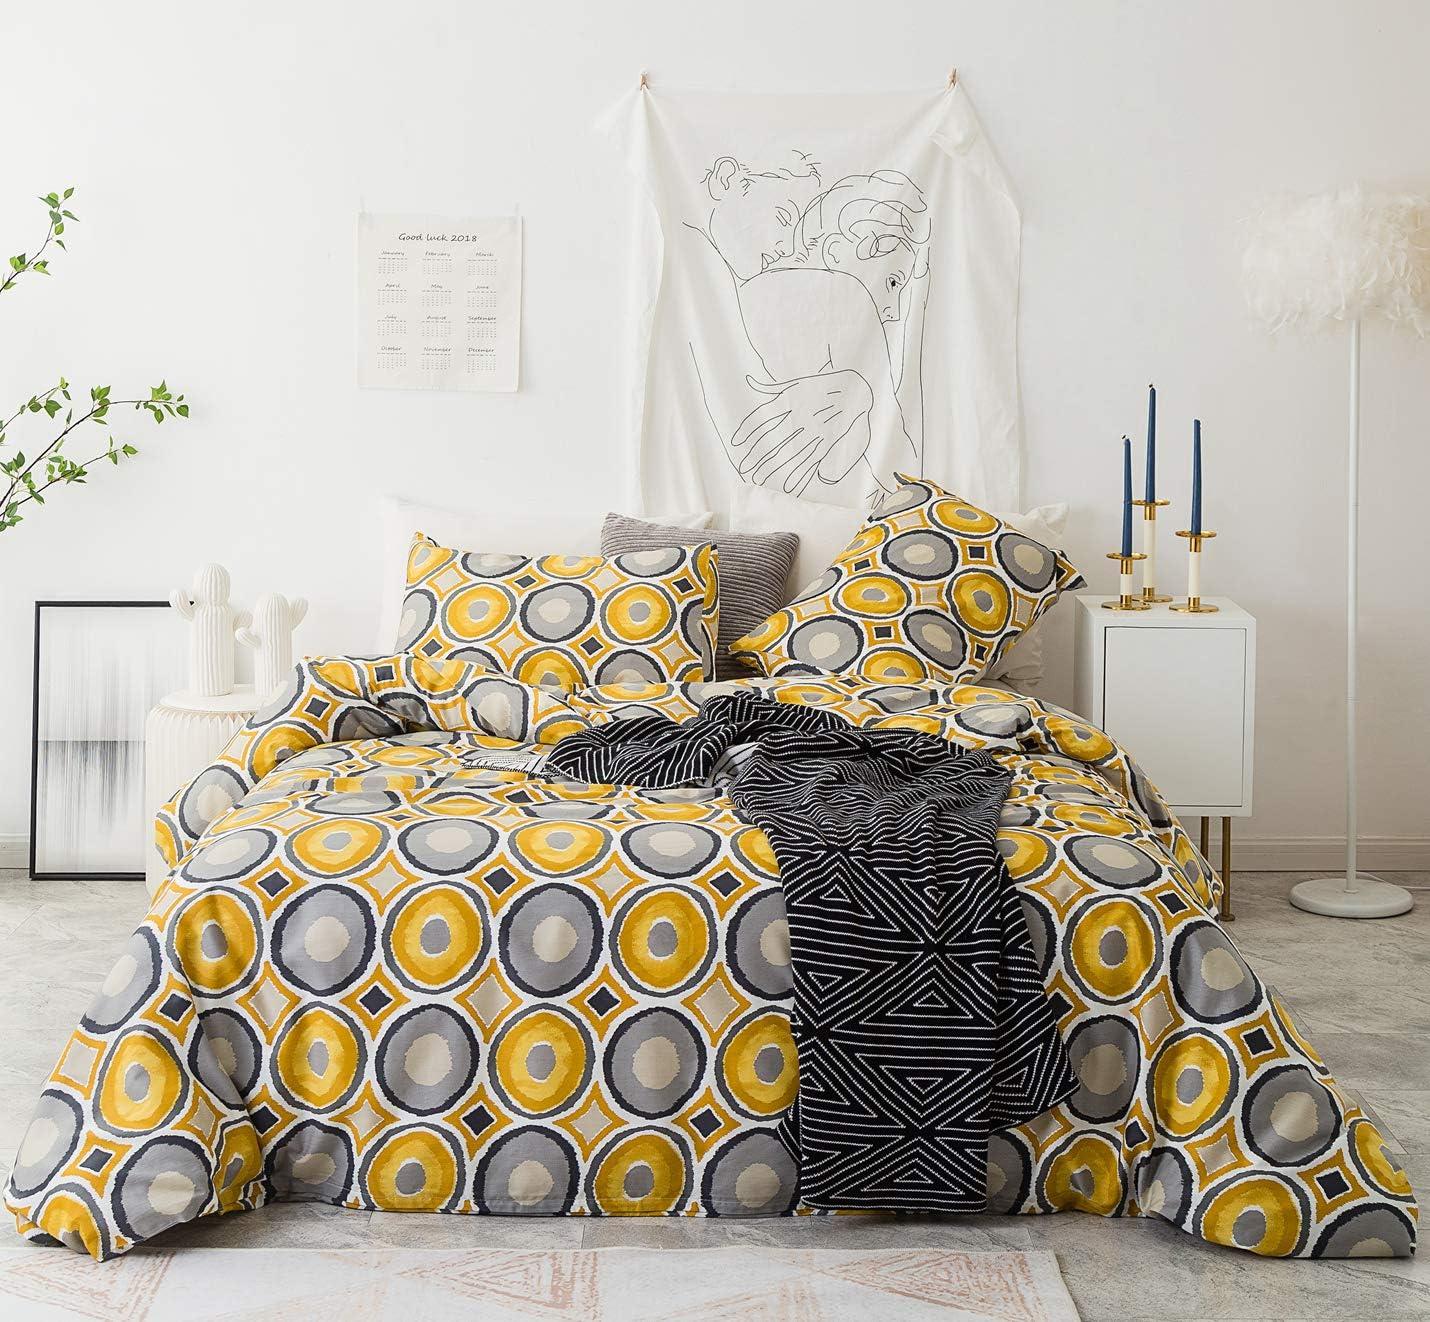 YuHeGuoJi 3 Pieces Duvet Cover Set 100% Cotton King Size Yellow Grey Gray Polka Dot Bedding Set